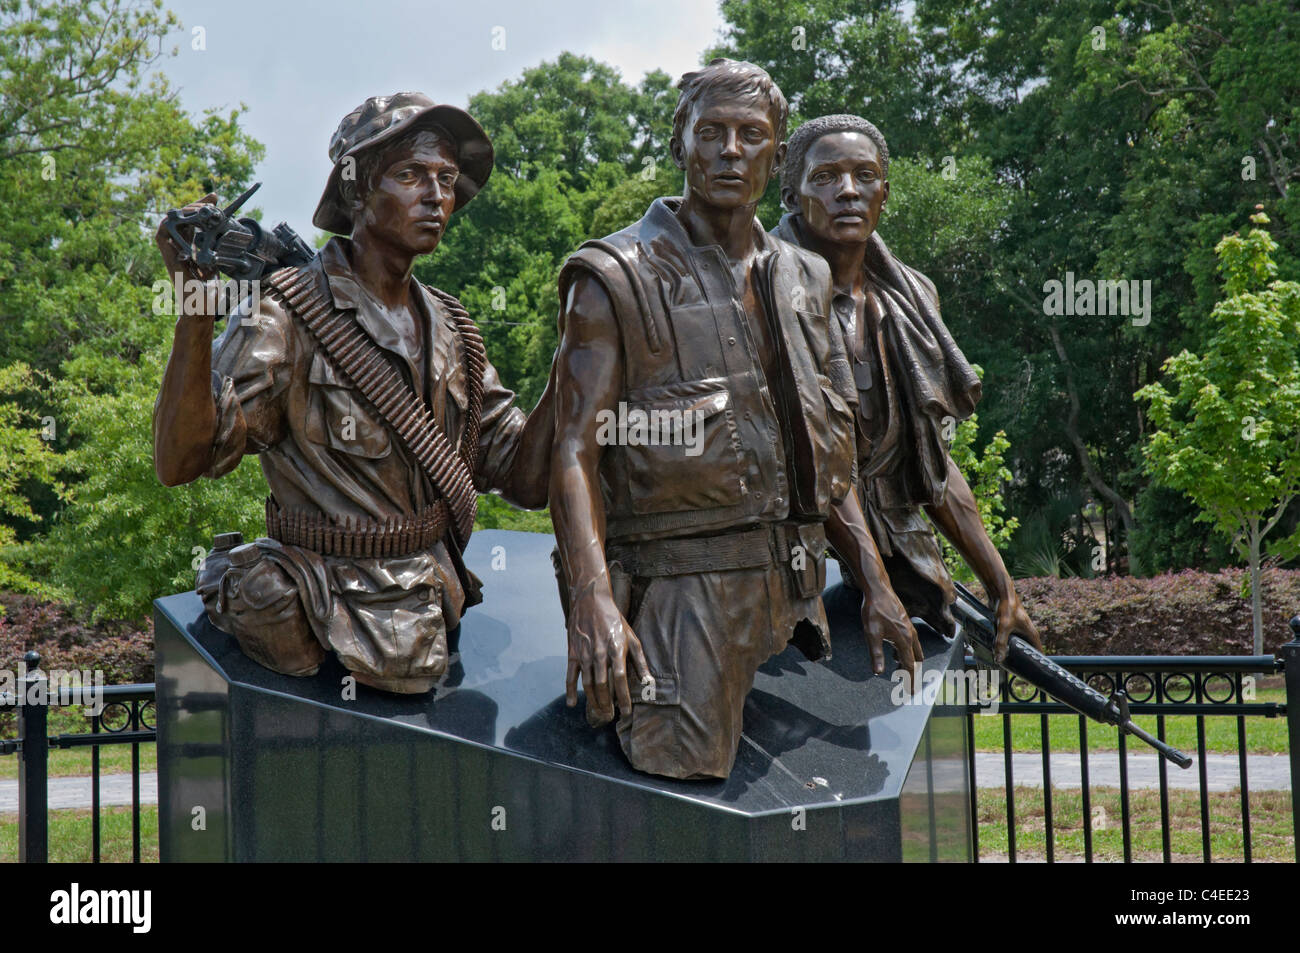 Florida Panhandle Apalachicola Florida.  Vietnam Veterans Memorial Plaza is a detail cast of the Vietnam Memorial - Stock Image